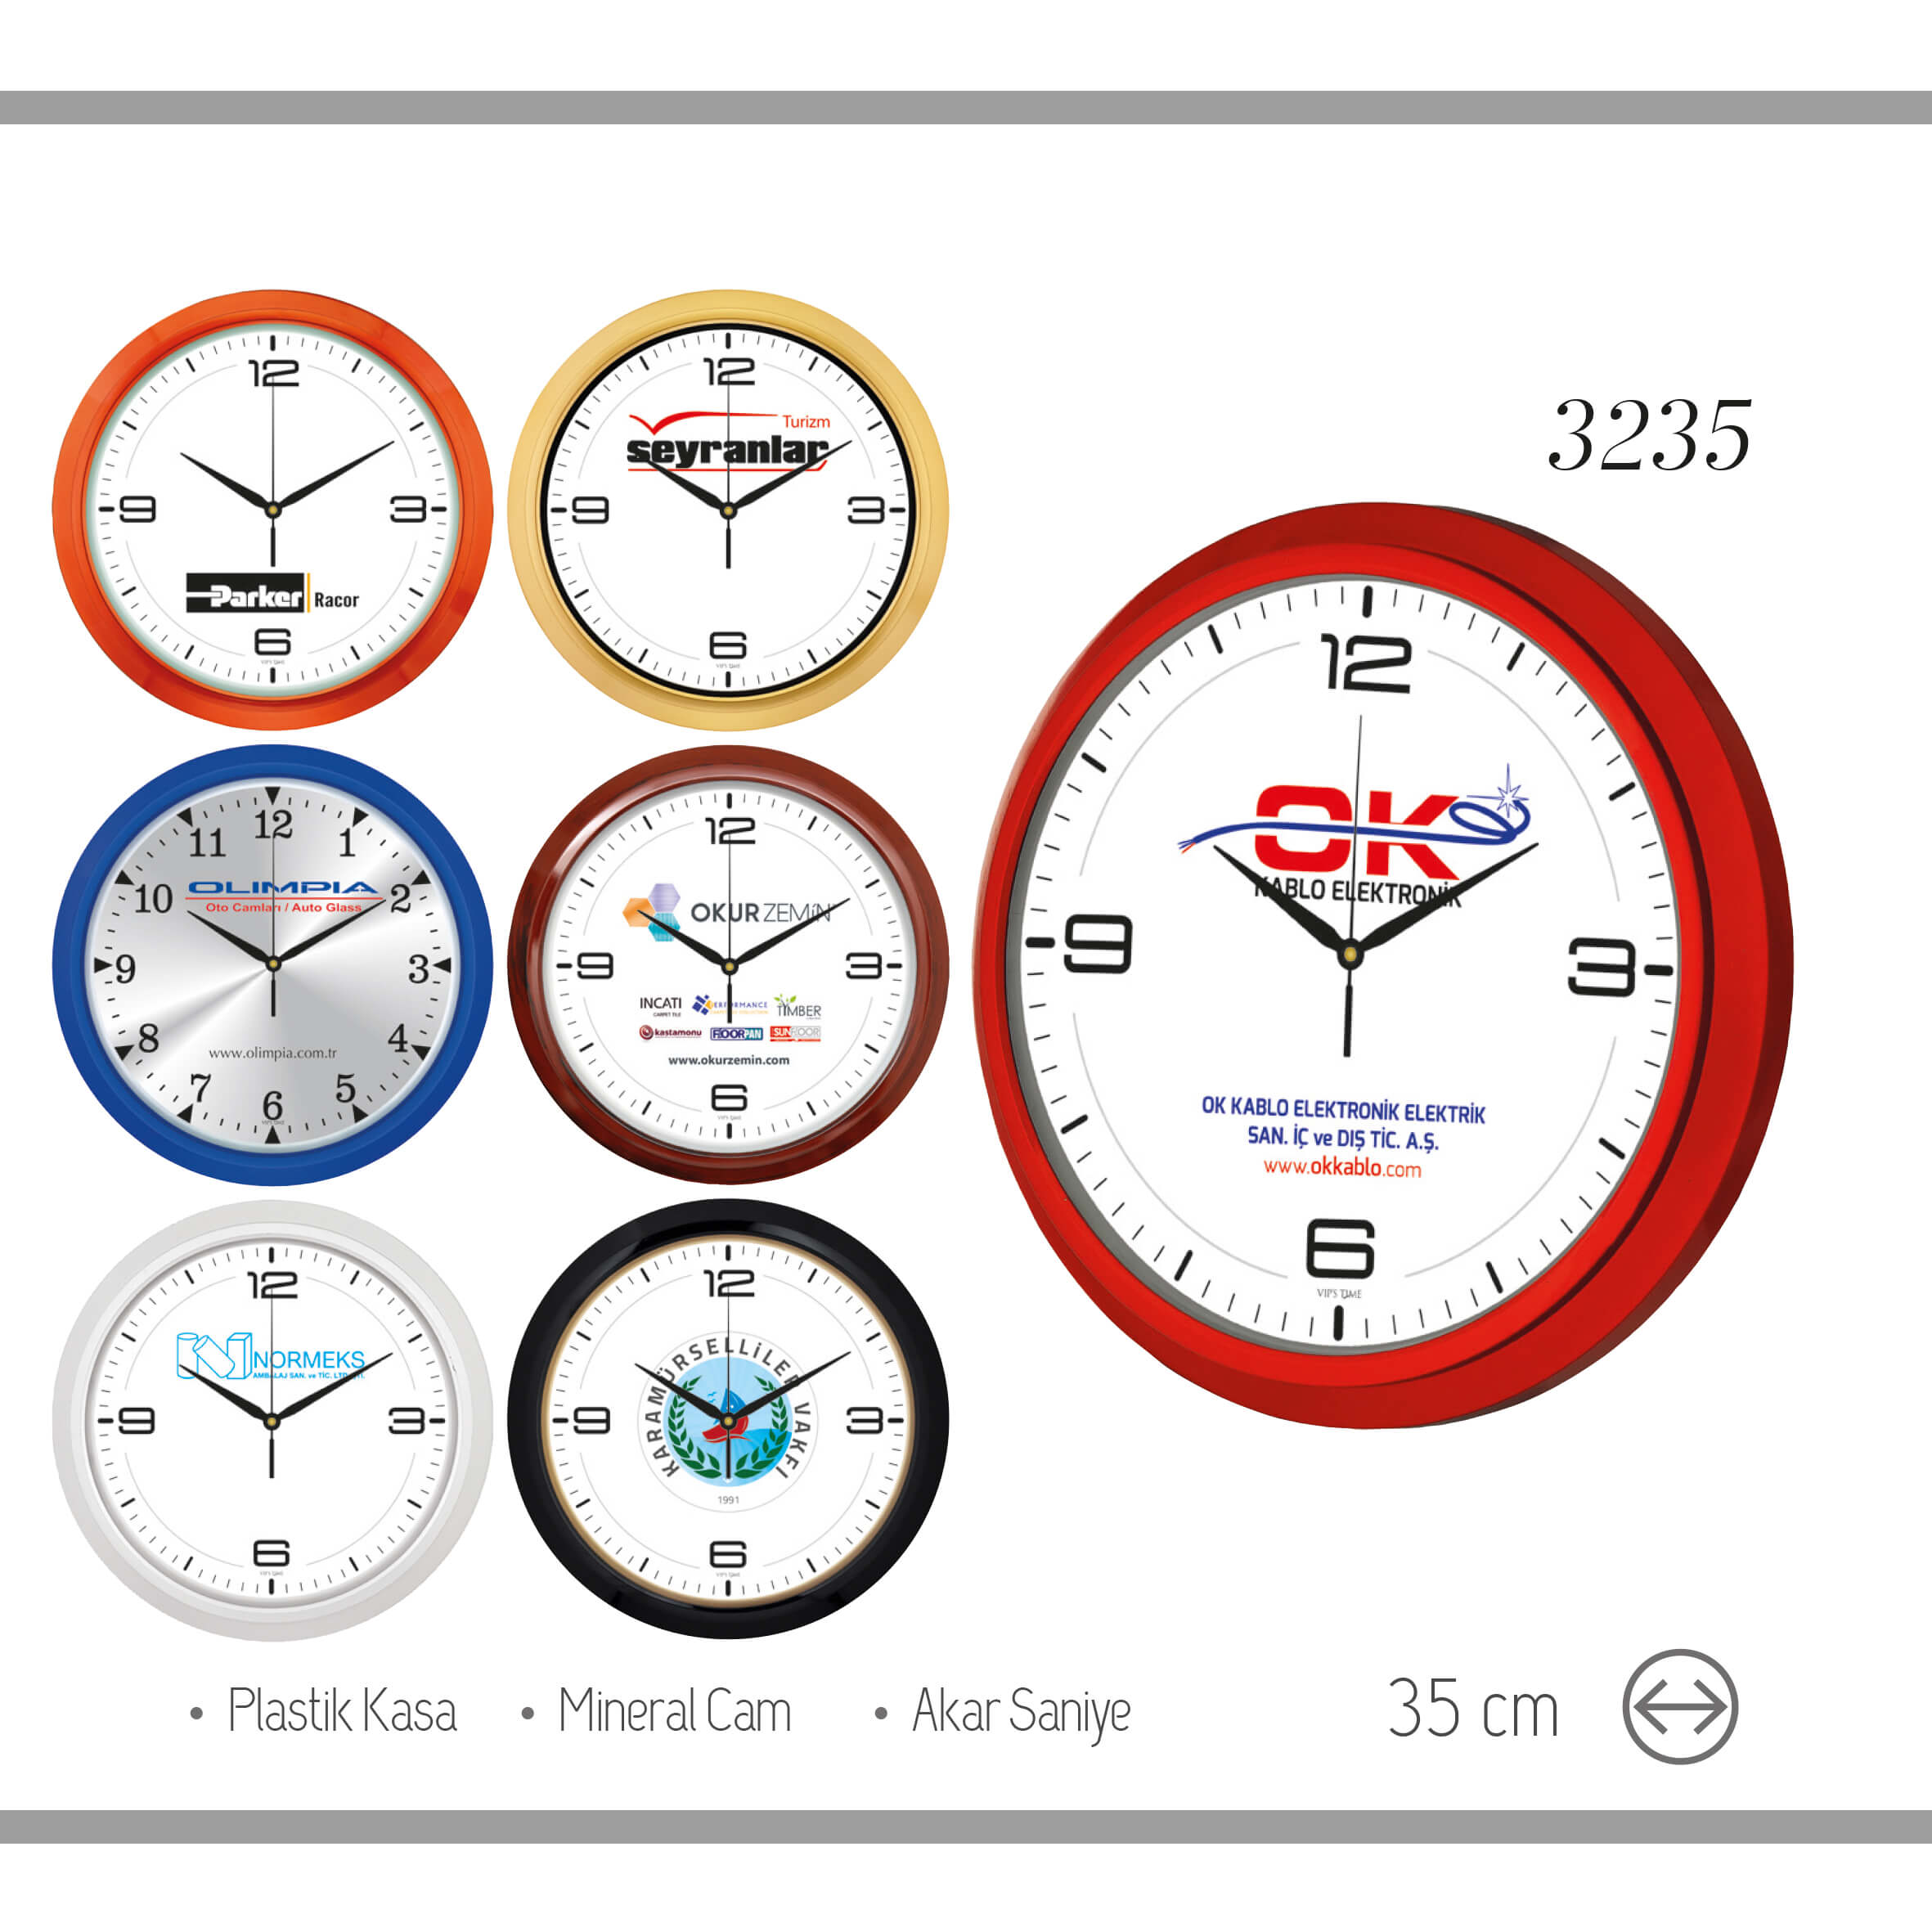 promosyon-promosyon ürünleri-promosyon saatler-duvar saatleri-promosyon duvar saati 3235